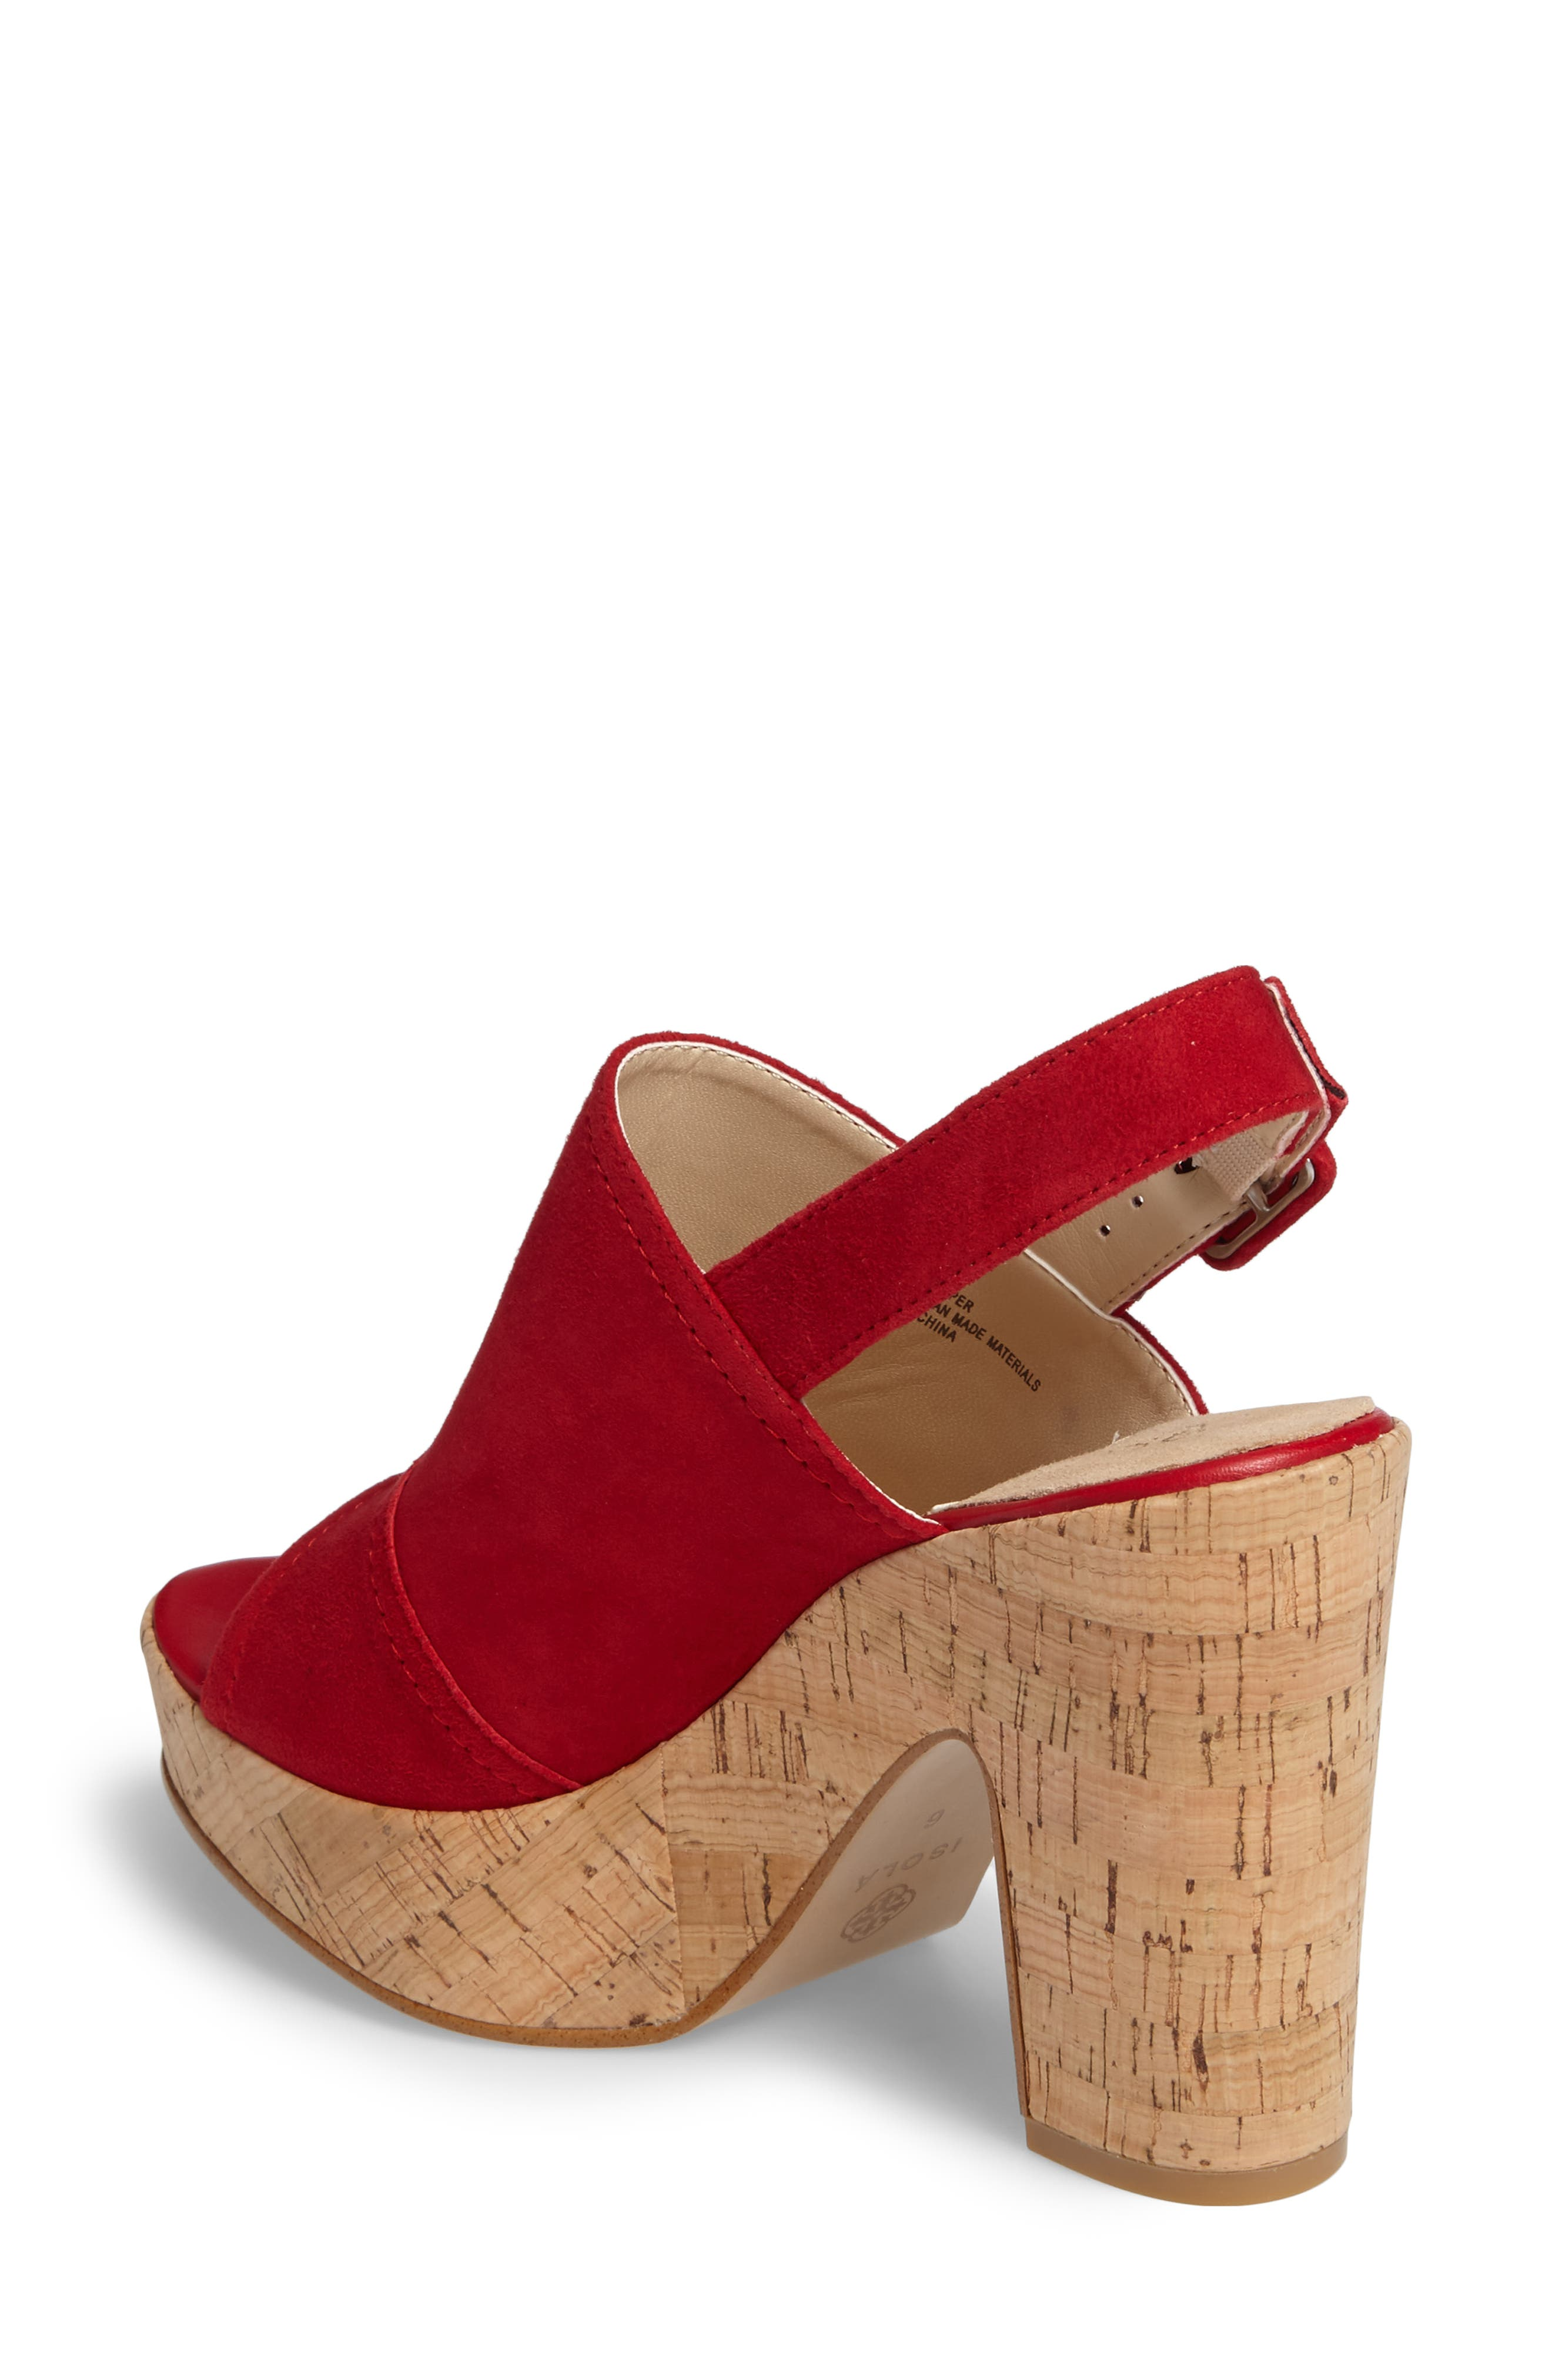 Gabriela Slingback Platform Sandal,                             Alternate thumbnail 2, color,                             Fire Red Suede